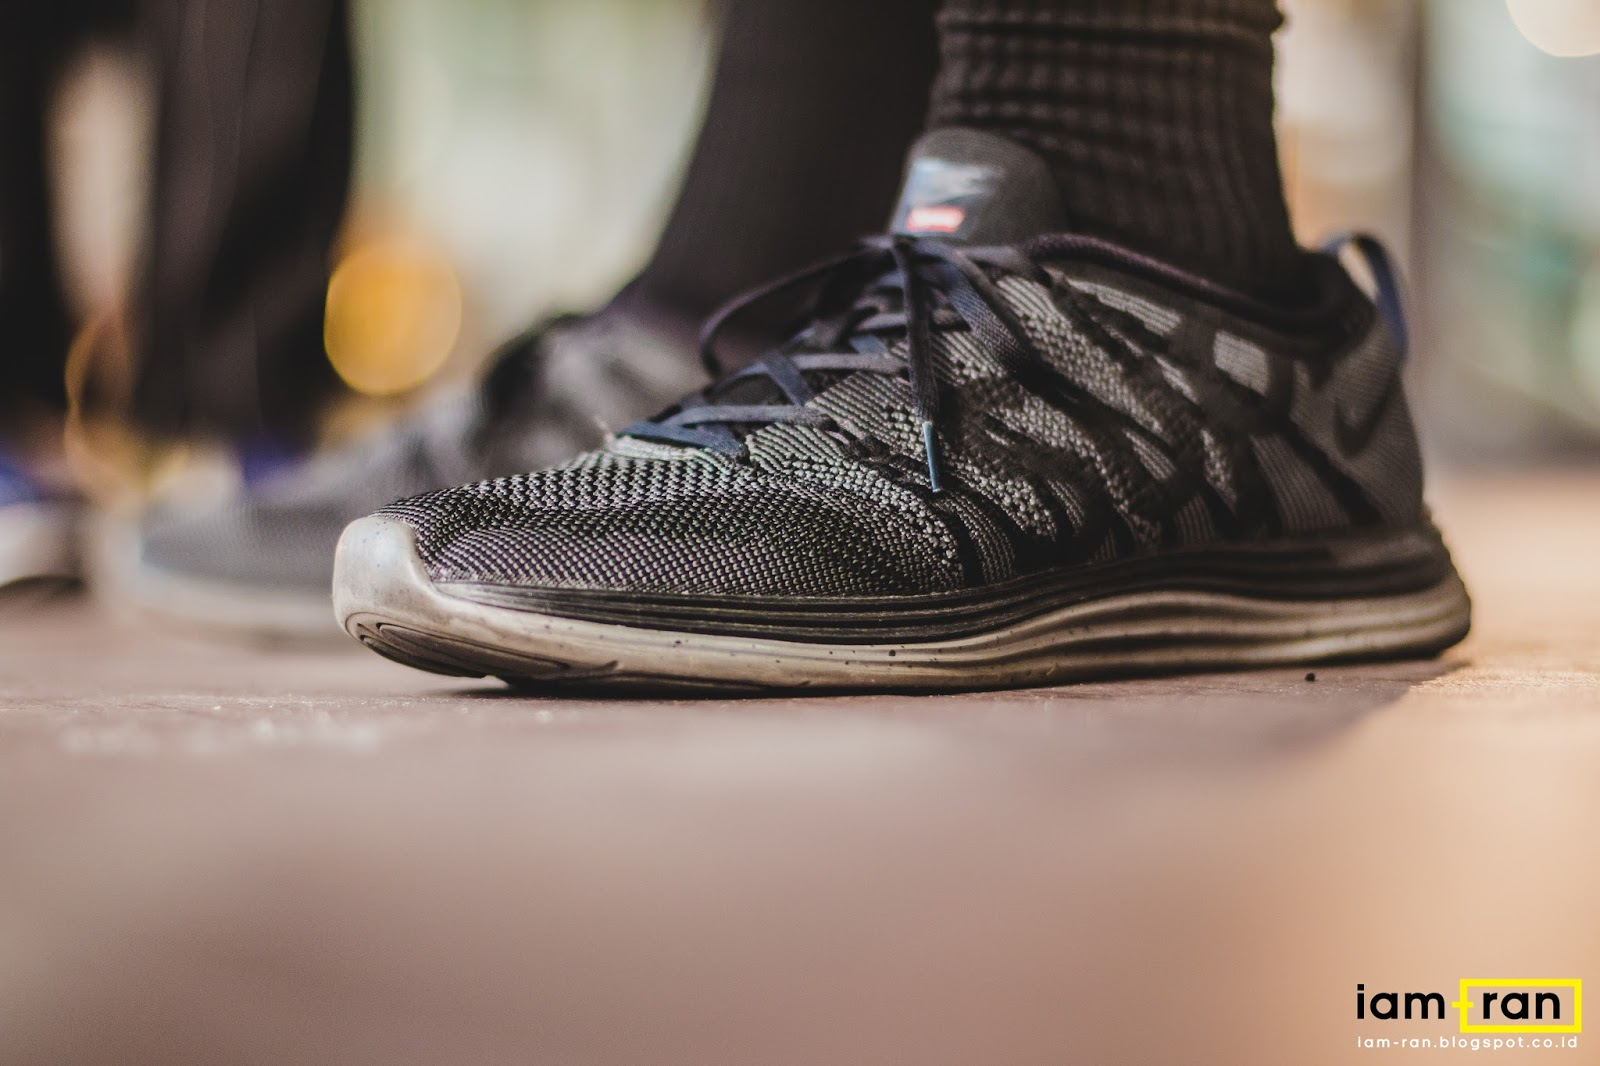 305b4d34db0a0 Dimas on feet. Sneakers   Nike Flyknit Lunar 1 x Supreme.  iam.ran06